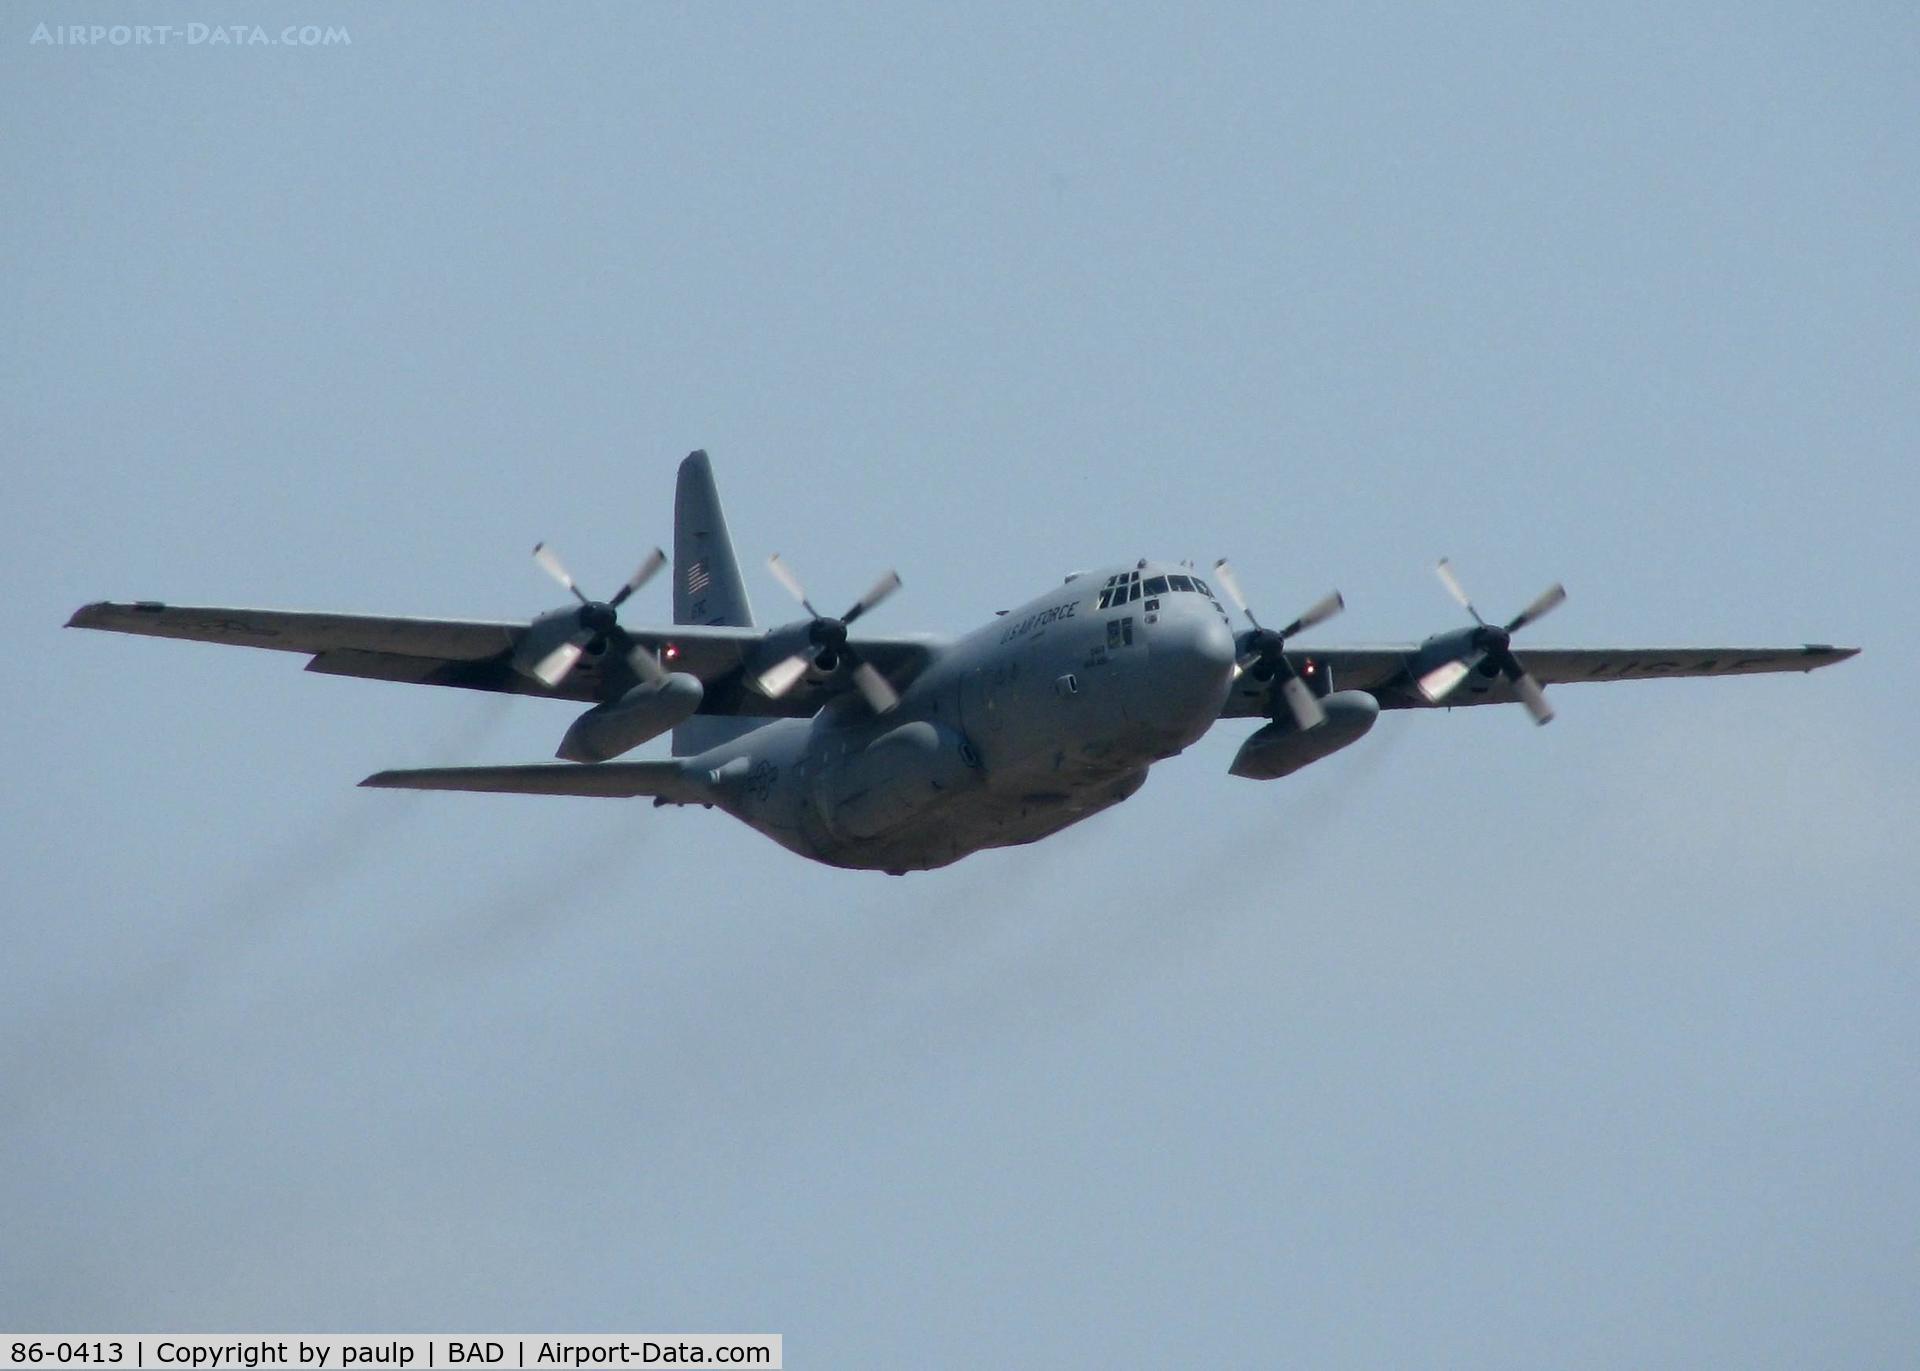 86-0413, 1986 Lockheed C-130H Hercules C/N 382-5100, Off of Rwy 15 at Barksdale Air Force Base.